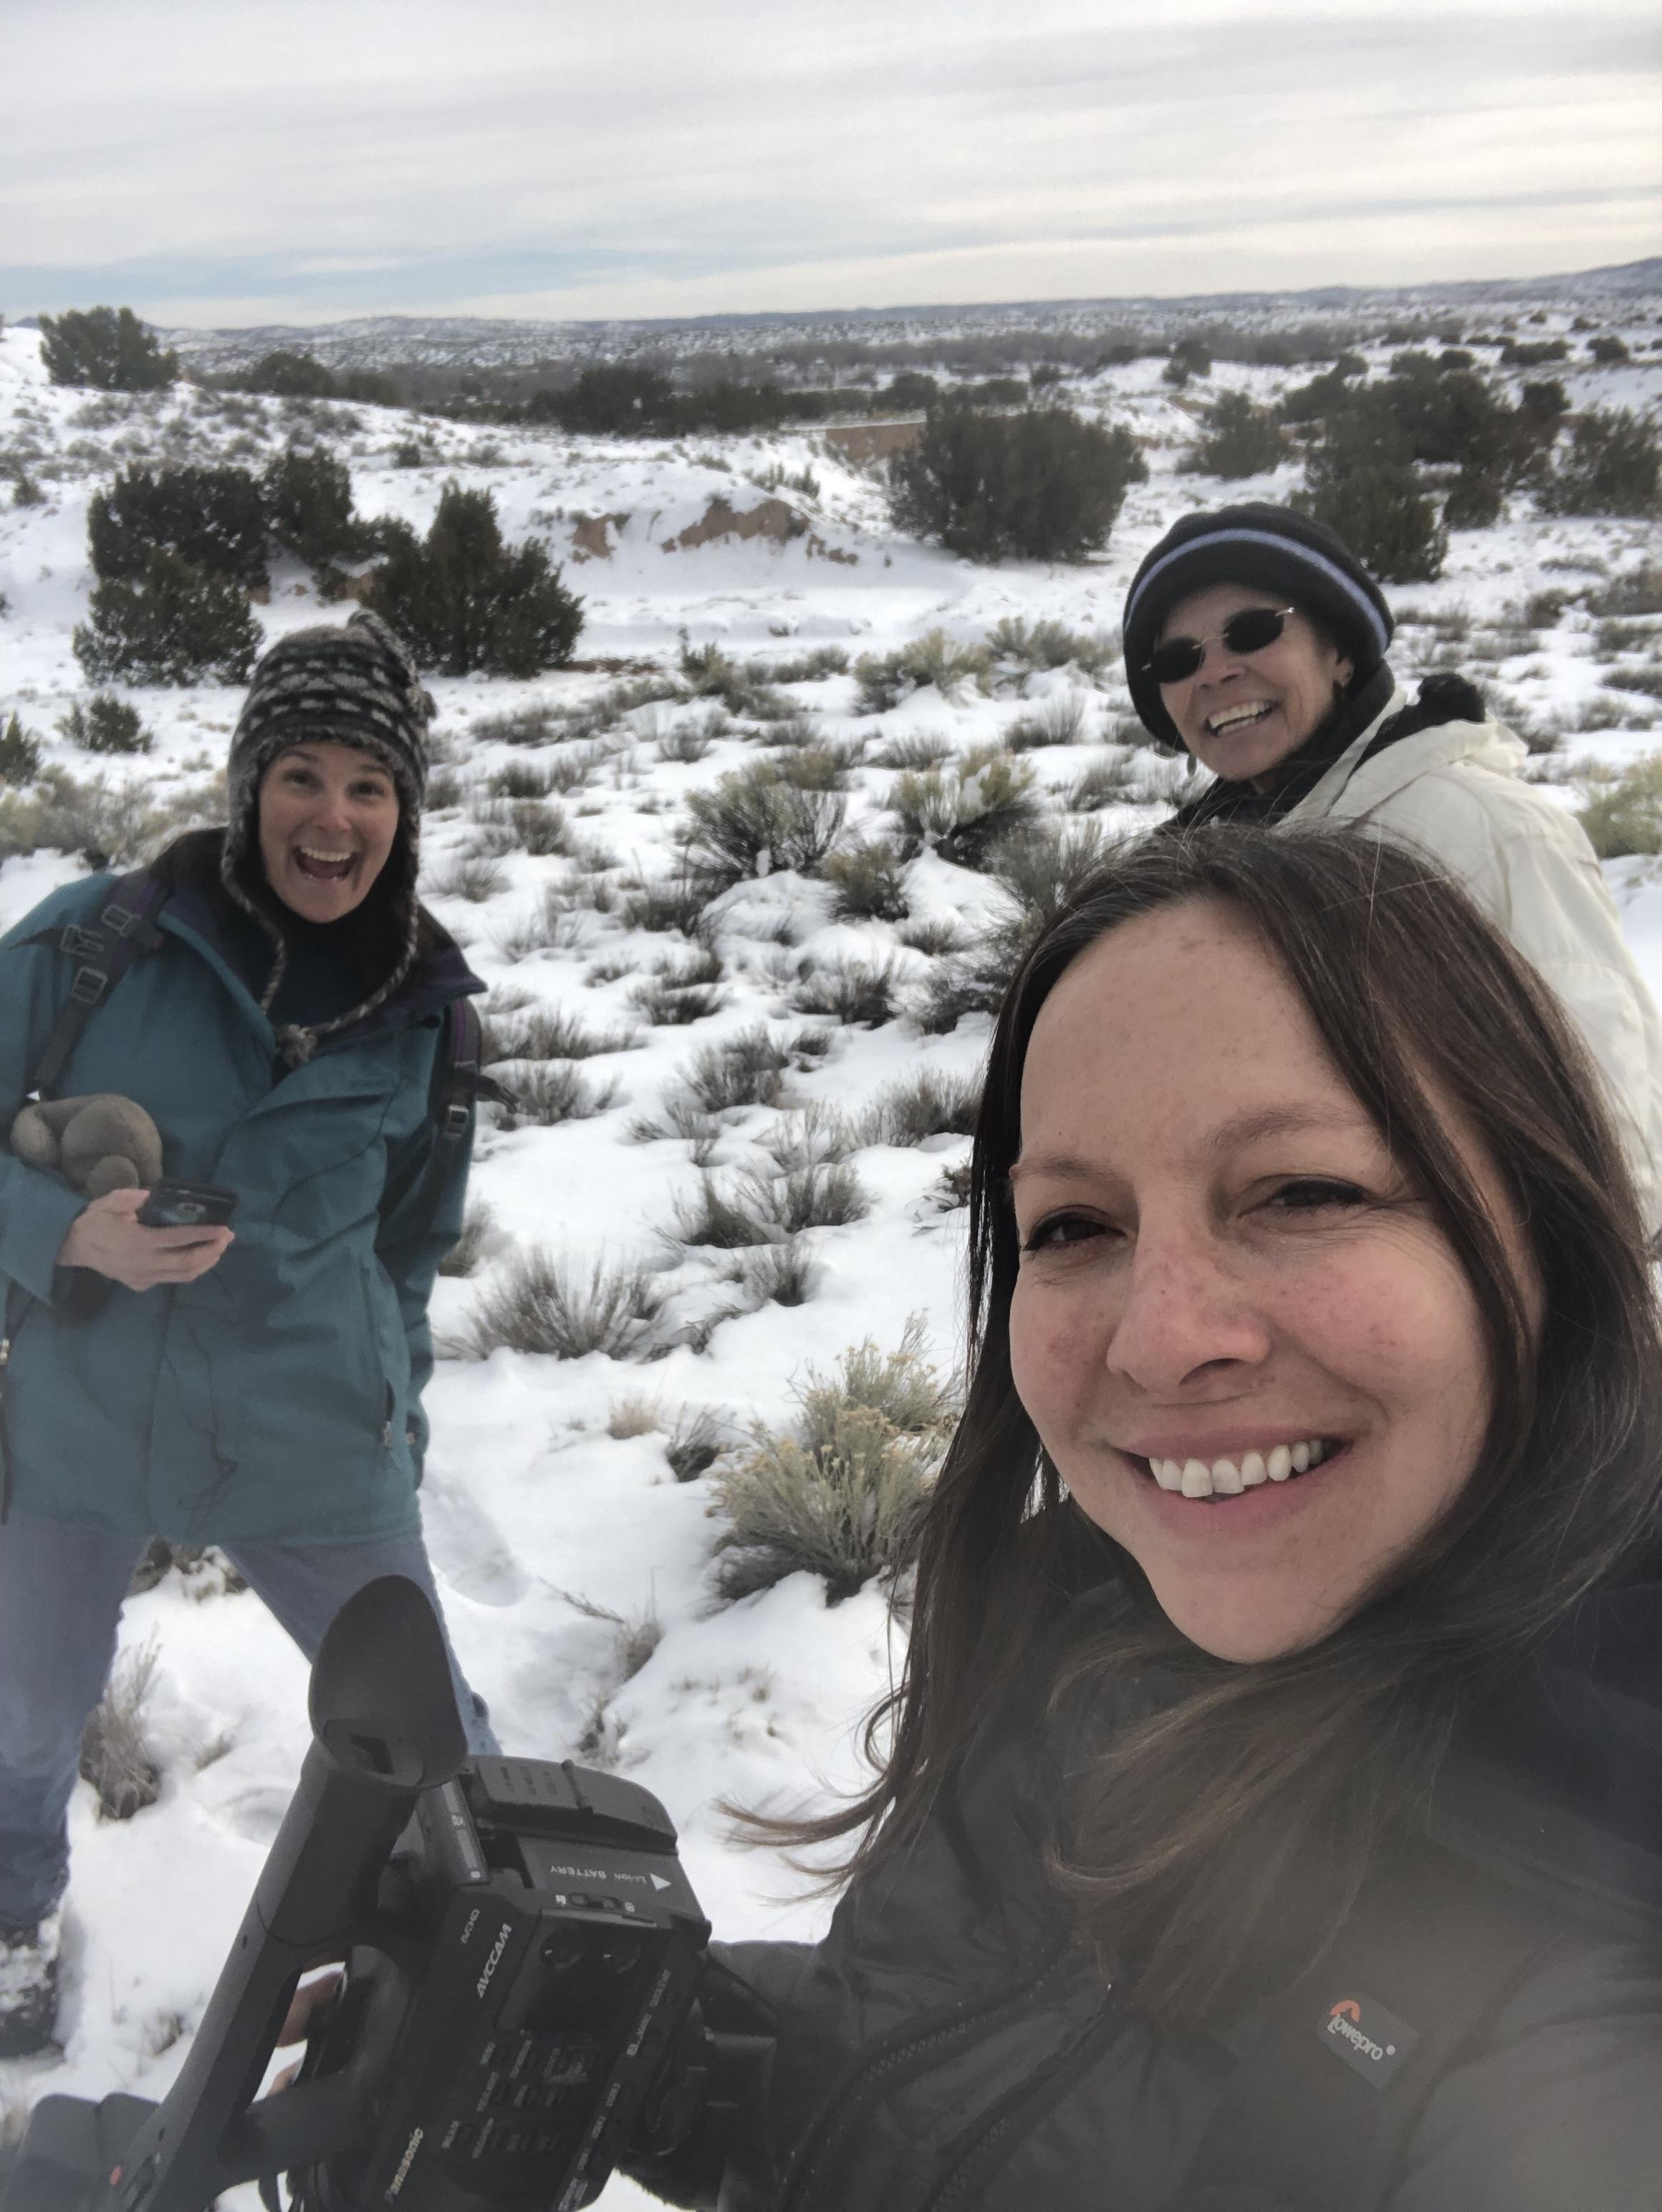 Drs Laura K Marsh, Lynne Gaffikin, and Stephanie Constantine filming the first SANDWALK podcast teaser, February 2019.